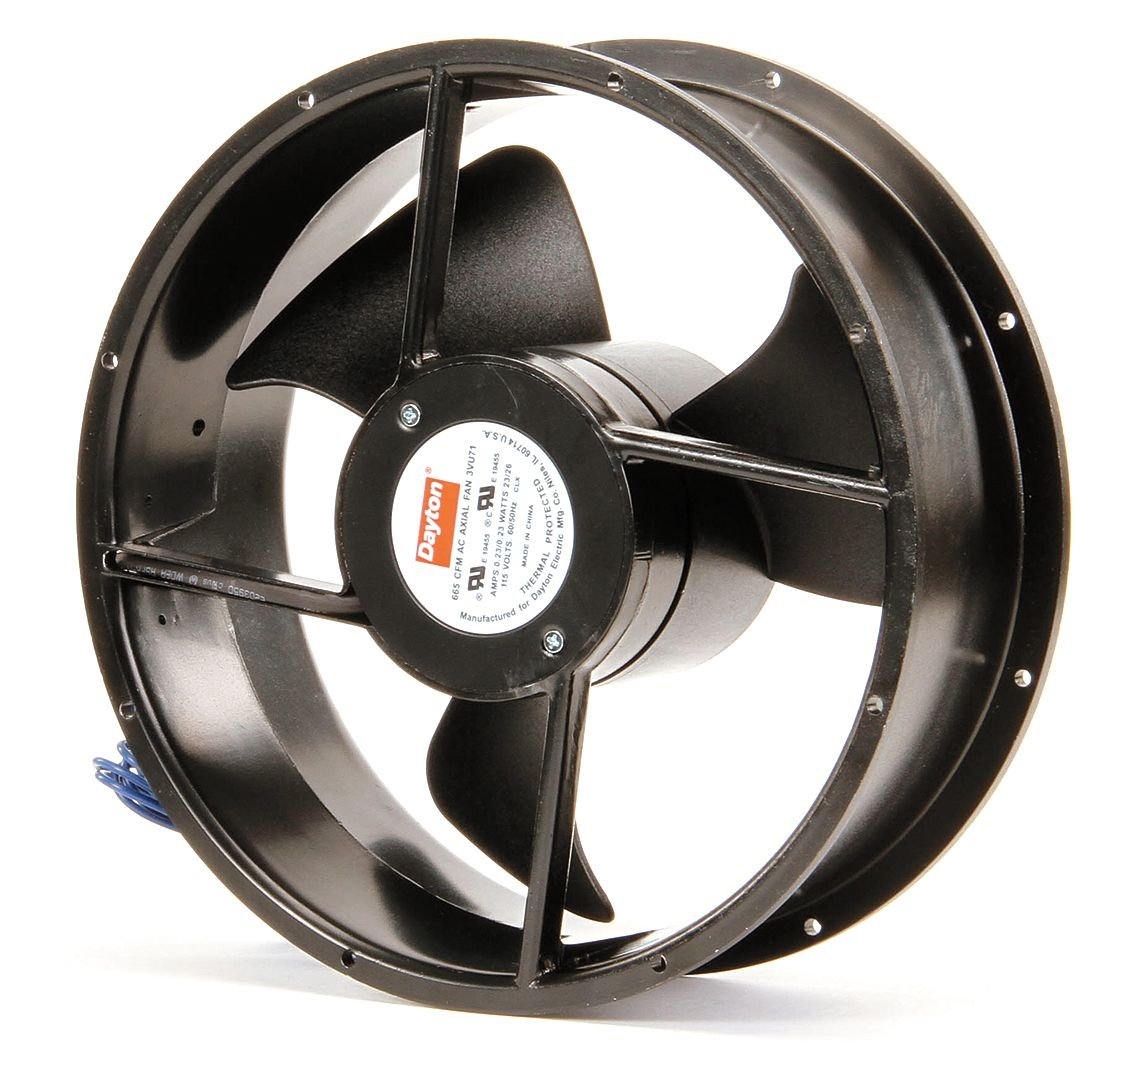 Dayton 3VU71 Fan, Axial, 550 CFM, 115v